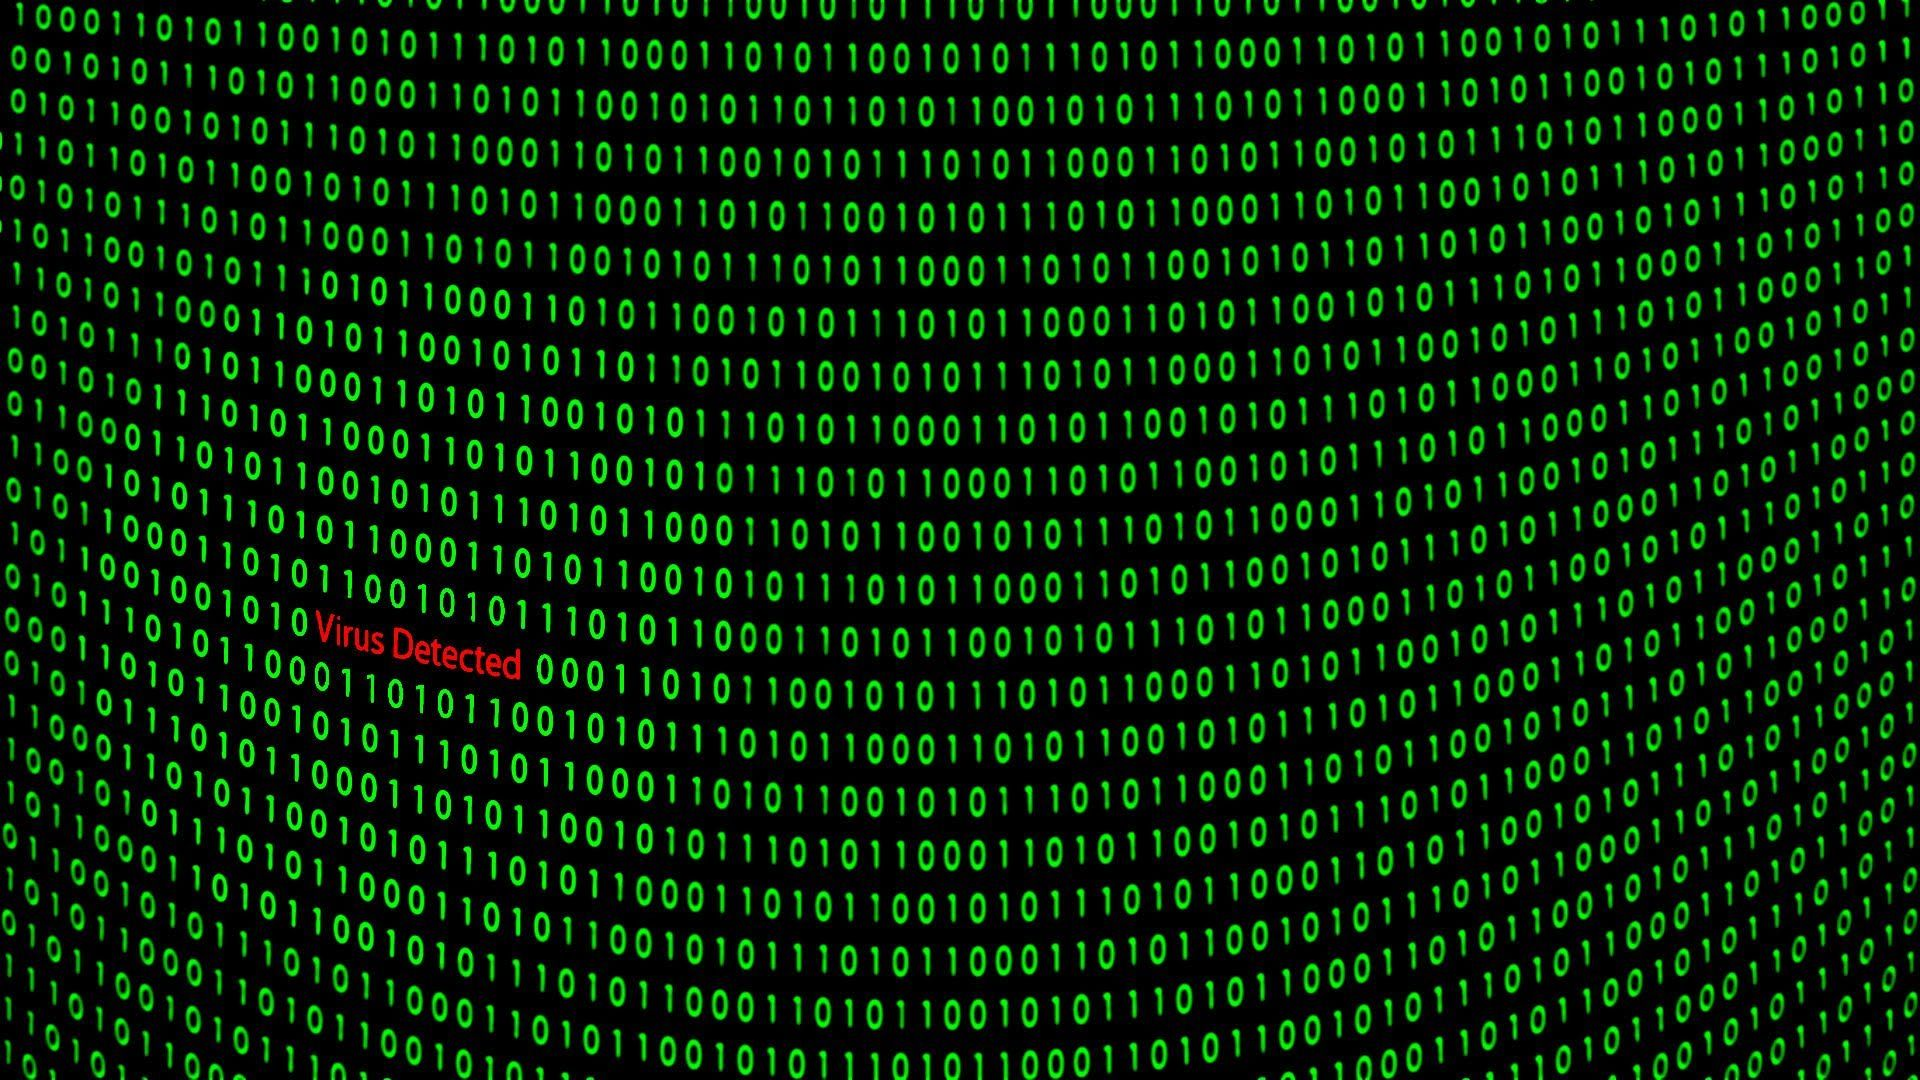 35 Computer Virus HD Wallpapers   Download at WallpaperBro 1920x1080